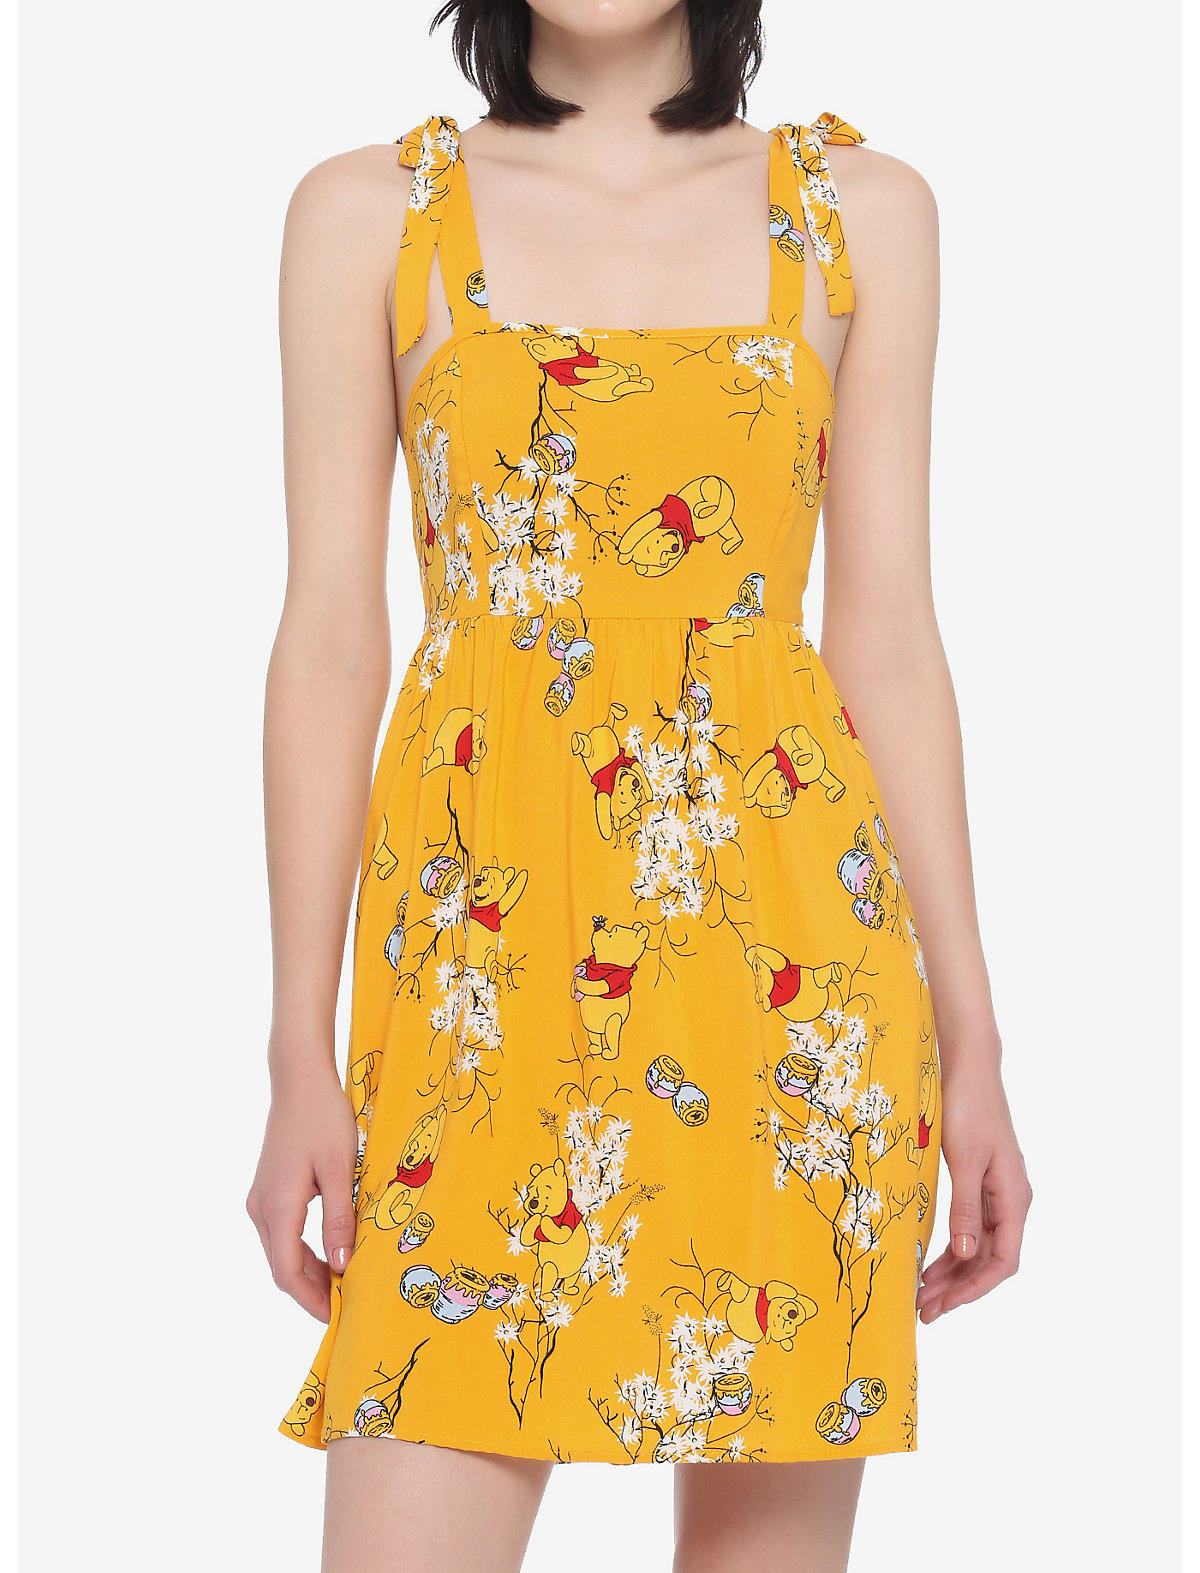 Disney Hot topic dresses